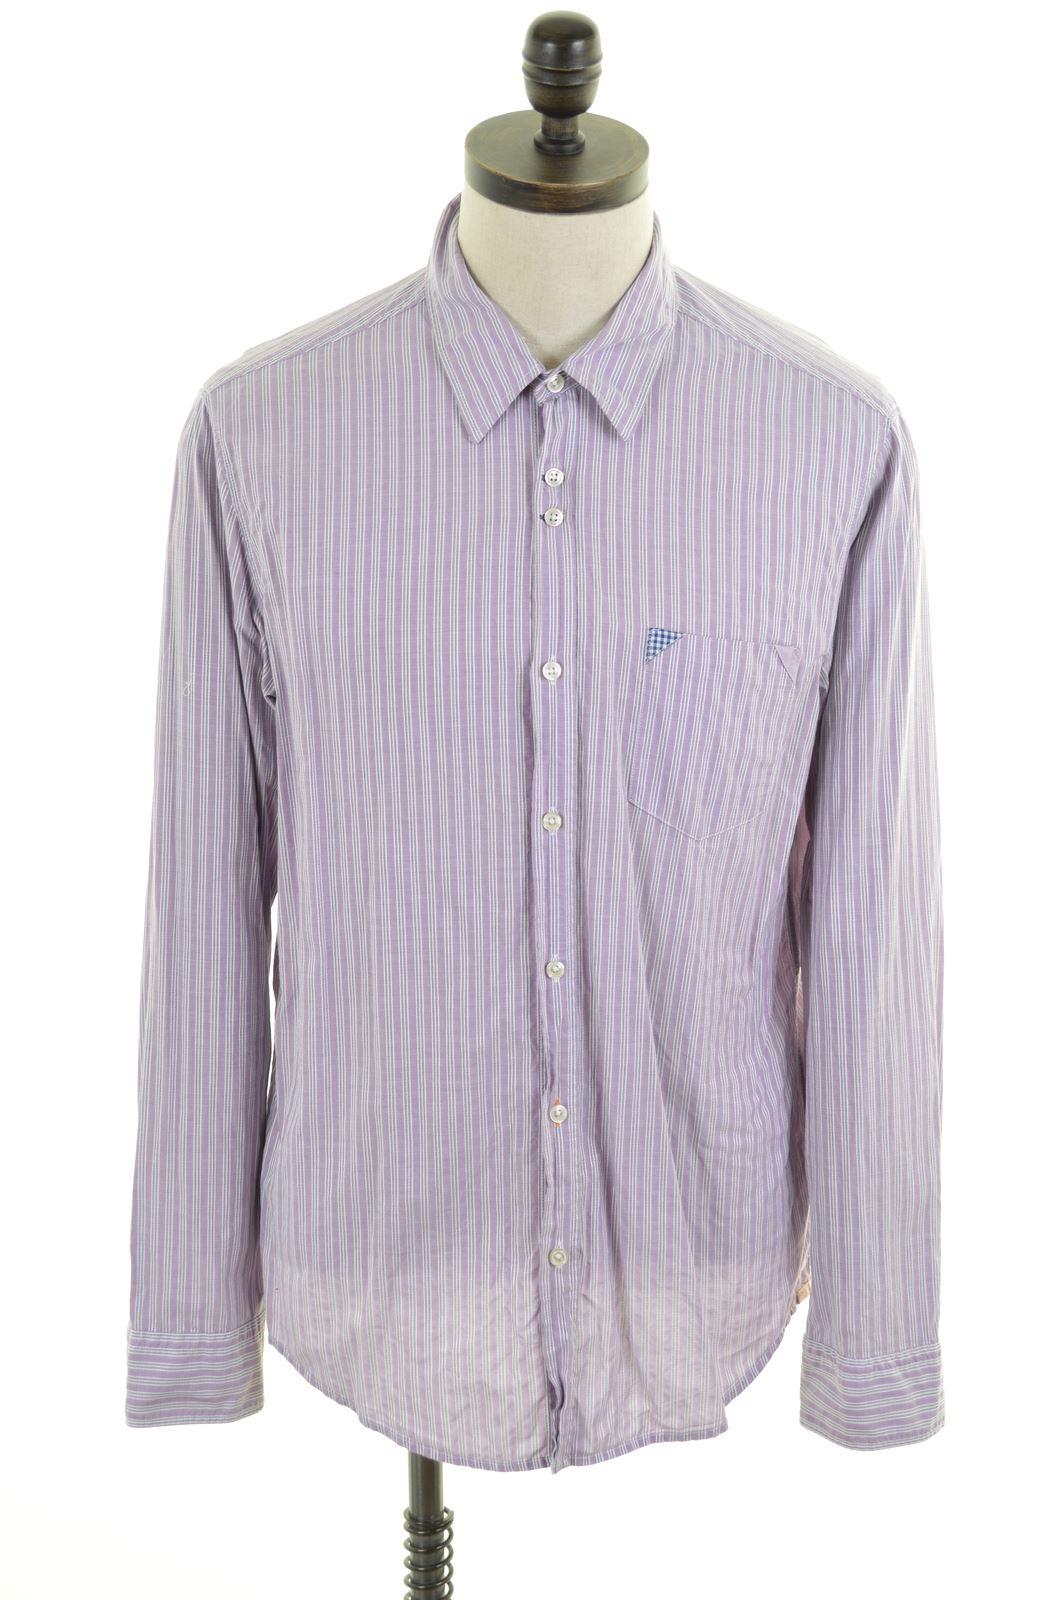 0f468cdc HUGO BOSS Mens Shirt XL Purple White Stripes Cotton Slim Fit | eBay